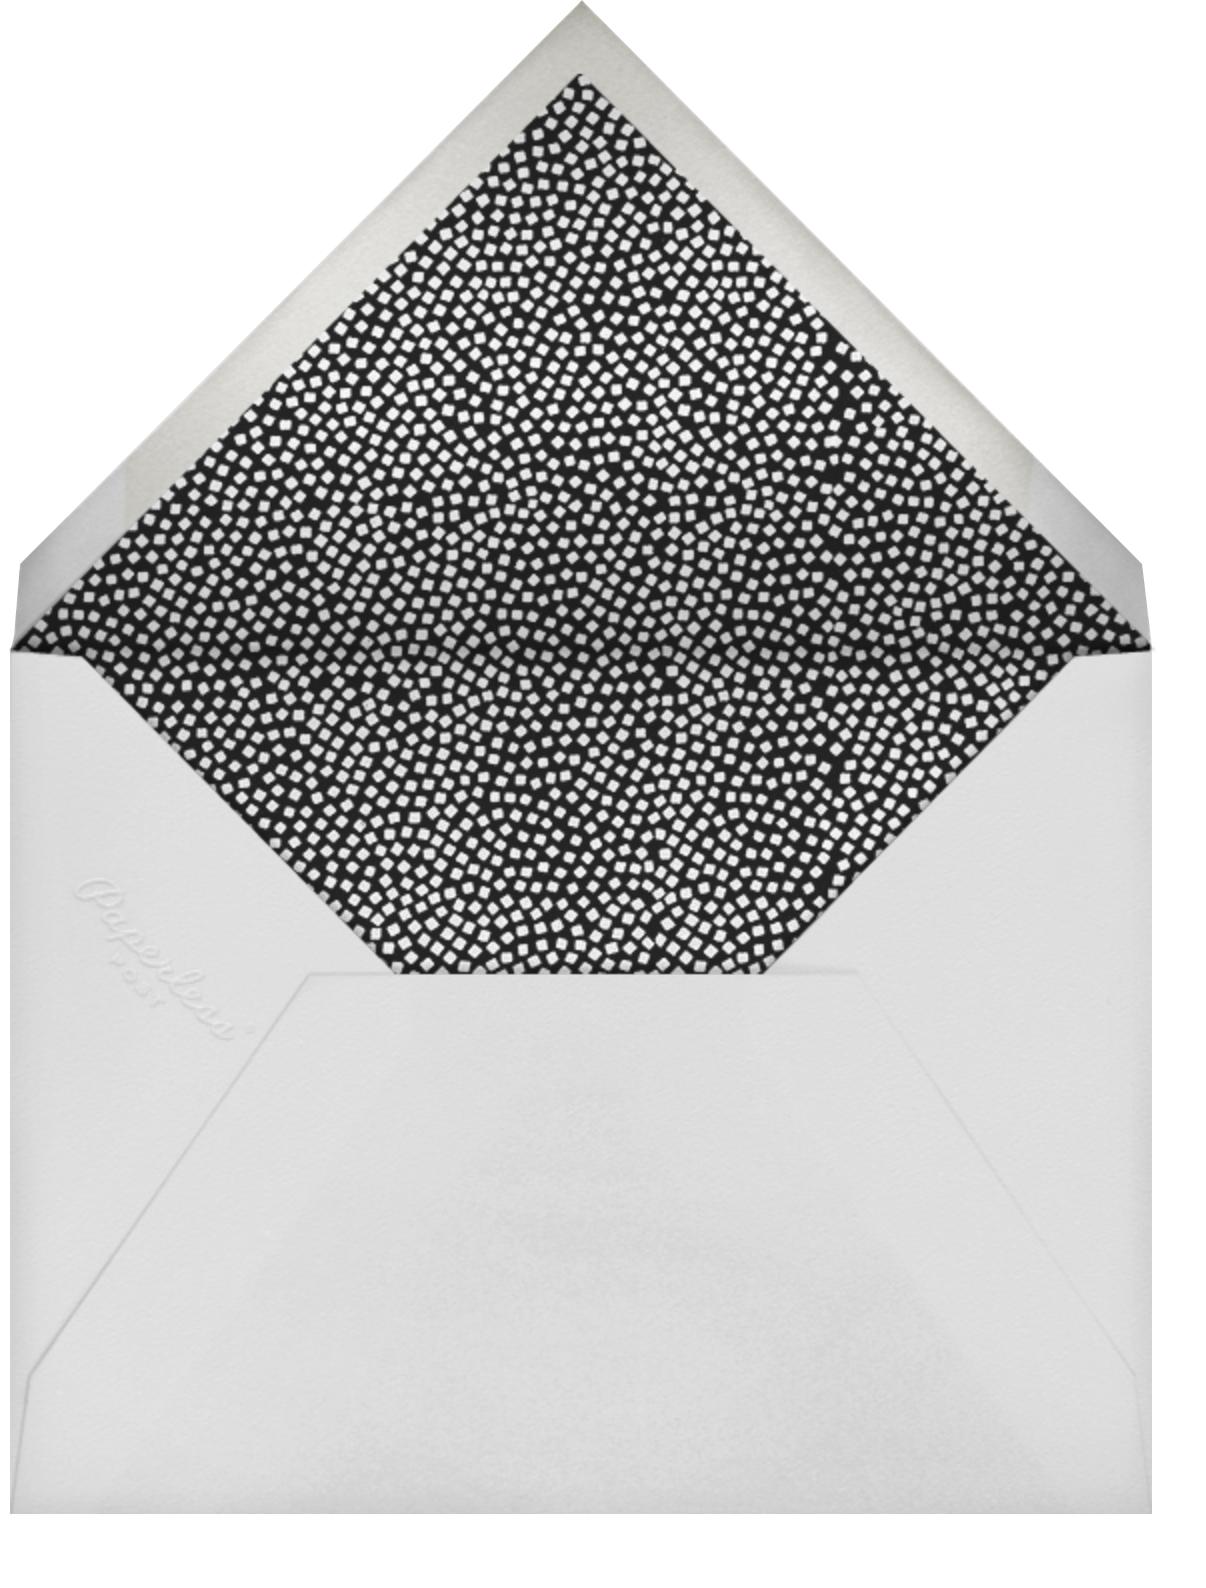 Konfetti - Gold - Kelly Wearstler - Corporate invitations - envelope back